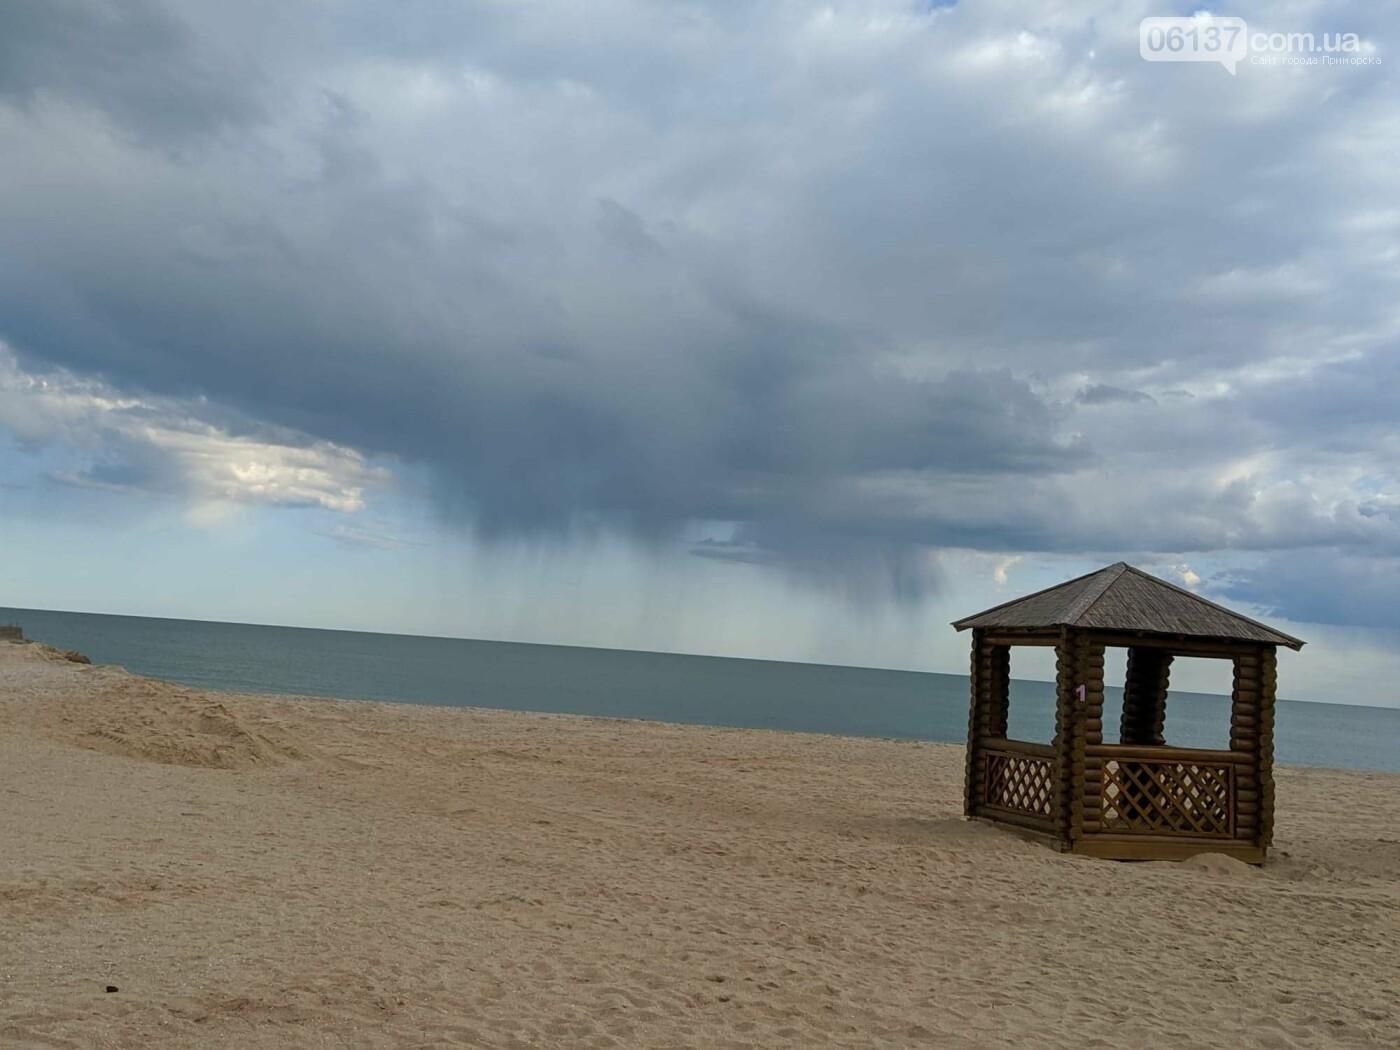 На запорожском курорте креативно решили вопрос с любителями помочиться на пляже. Фото/Видео , фото-4